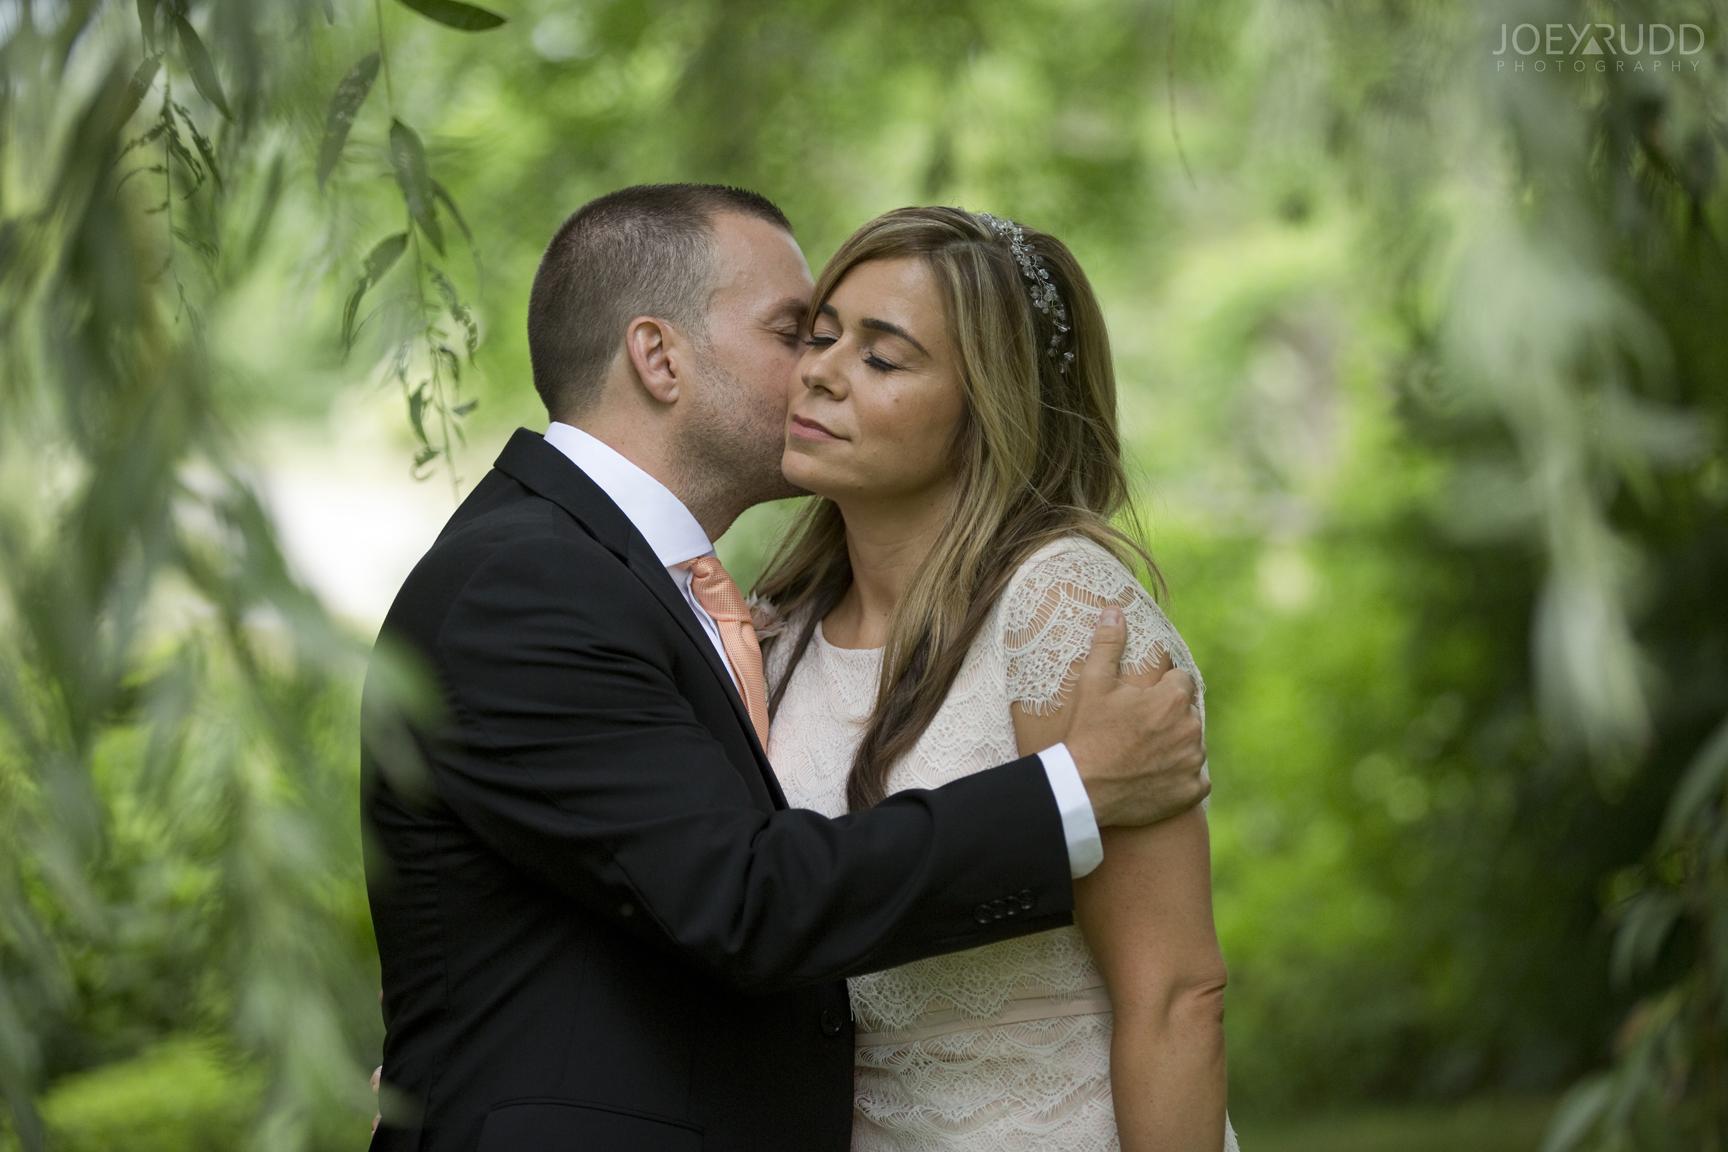 Elopement Wedding by Ottawa Wedding Photographer Joey Rudd Photography Arboretum Weeping Willow